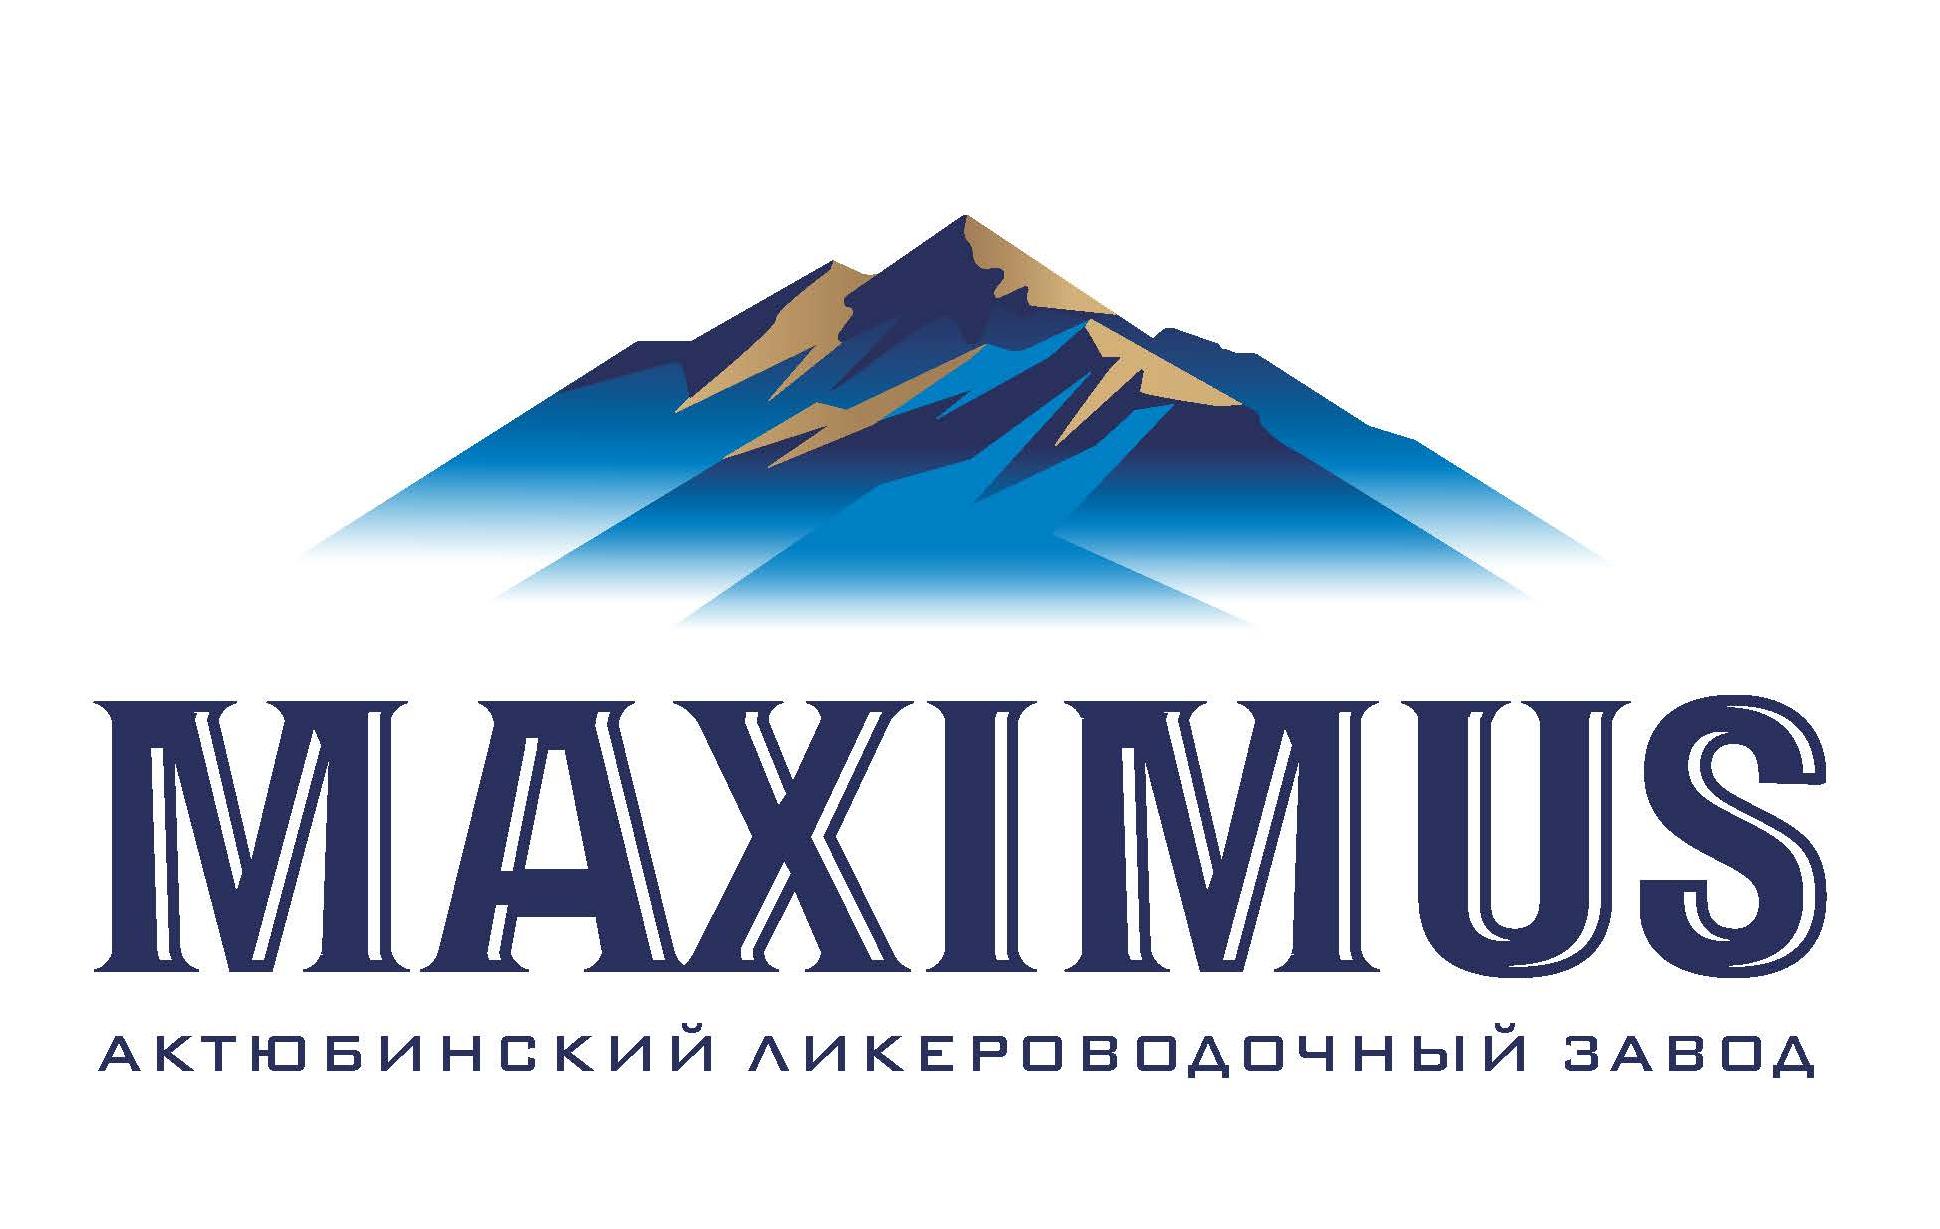 Maximus Spirits - Swallow Bird, Taigun, Star Doktor,Spirtov Vodkas